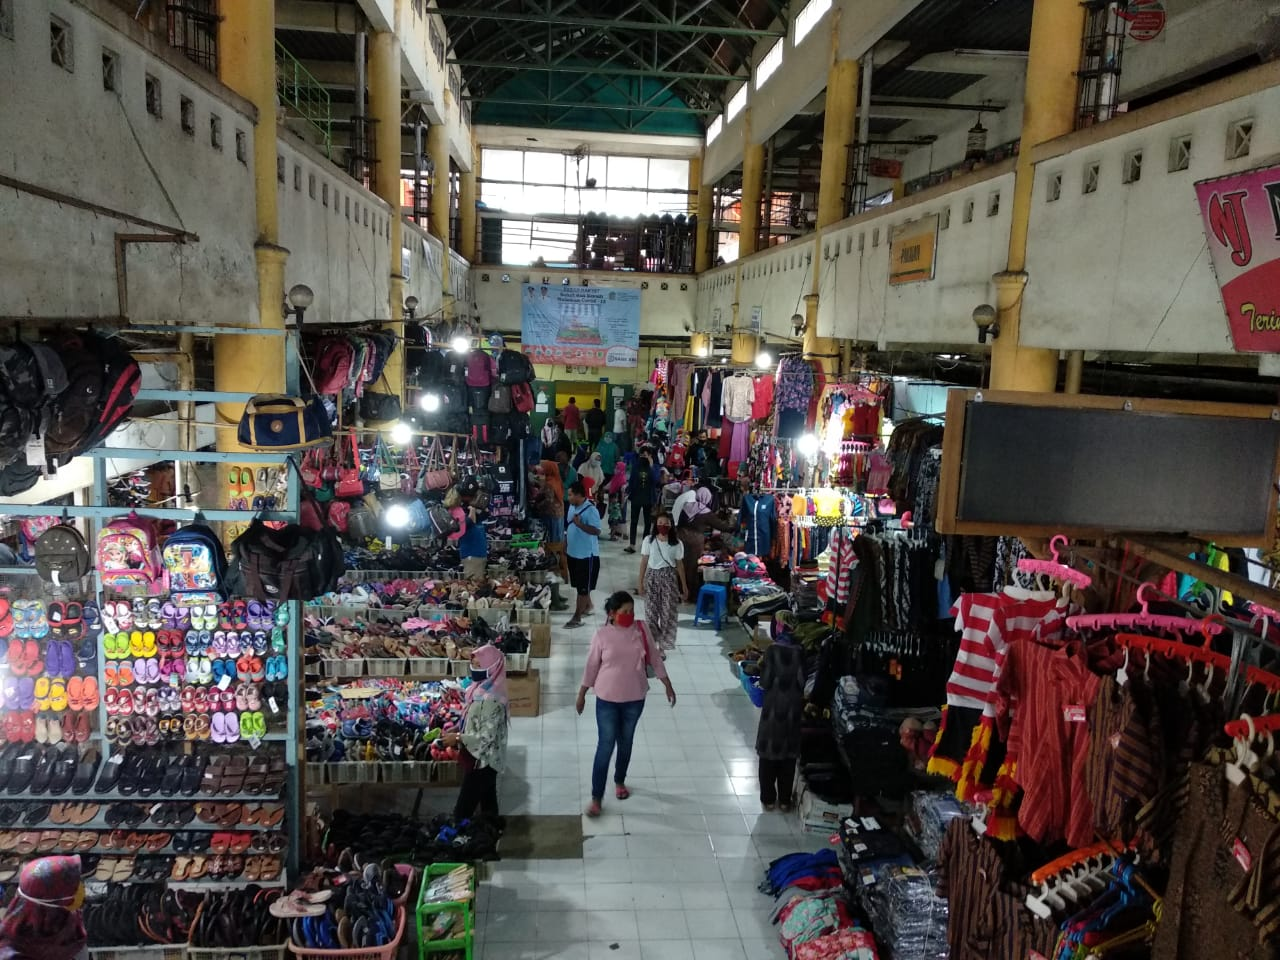 Diawasi Sat Pol PP, Pasar Tradisional Diperbolehkan Buka Selama Pengetatan Kegiatan Masyarakat 157